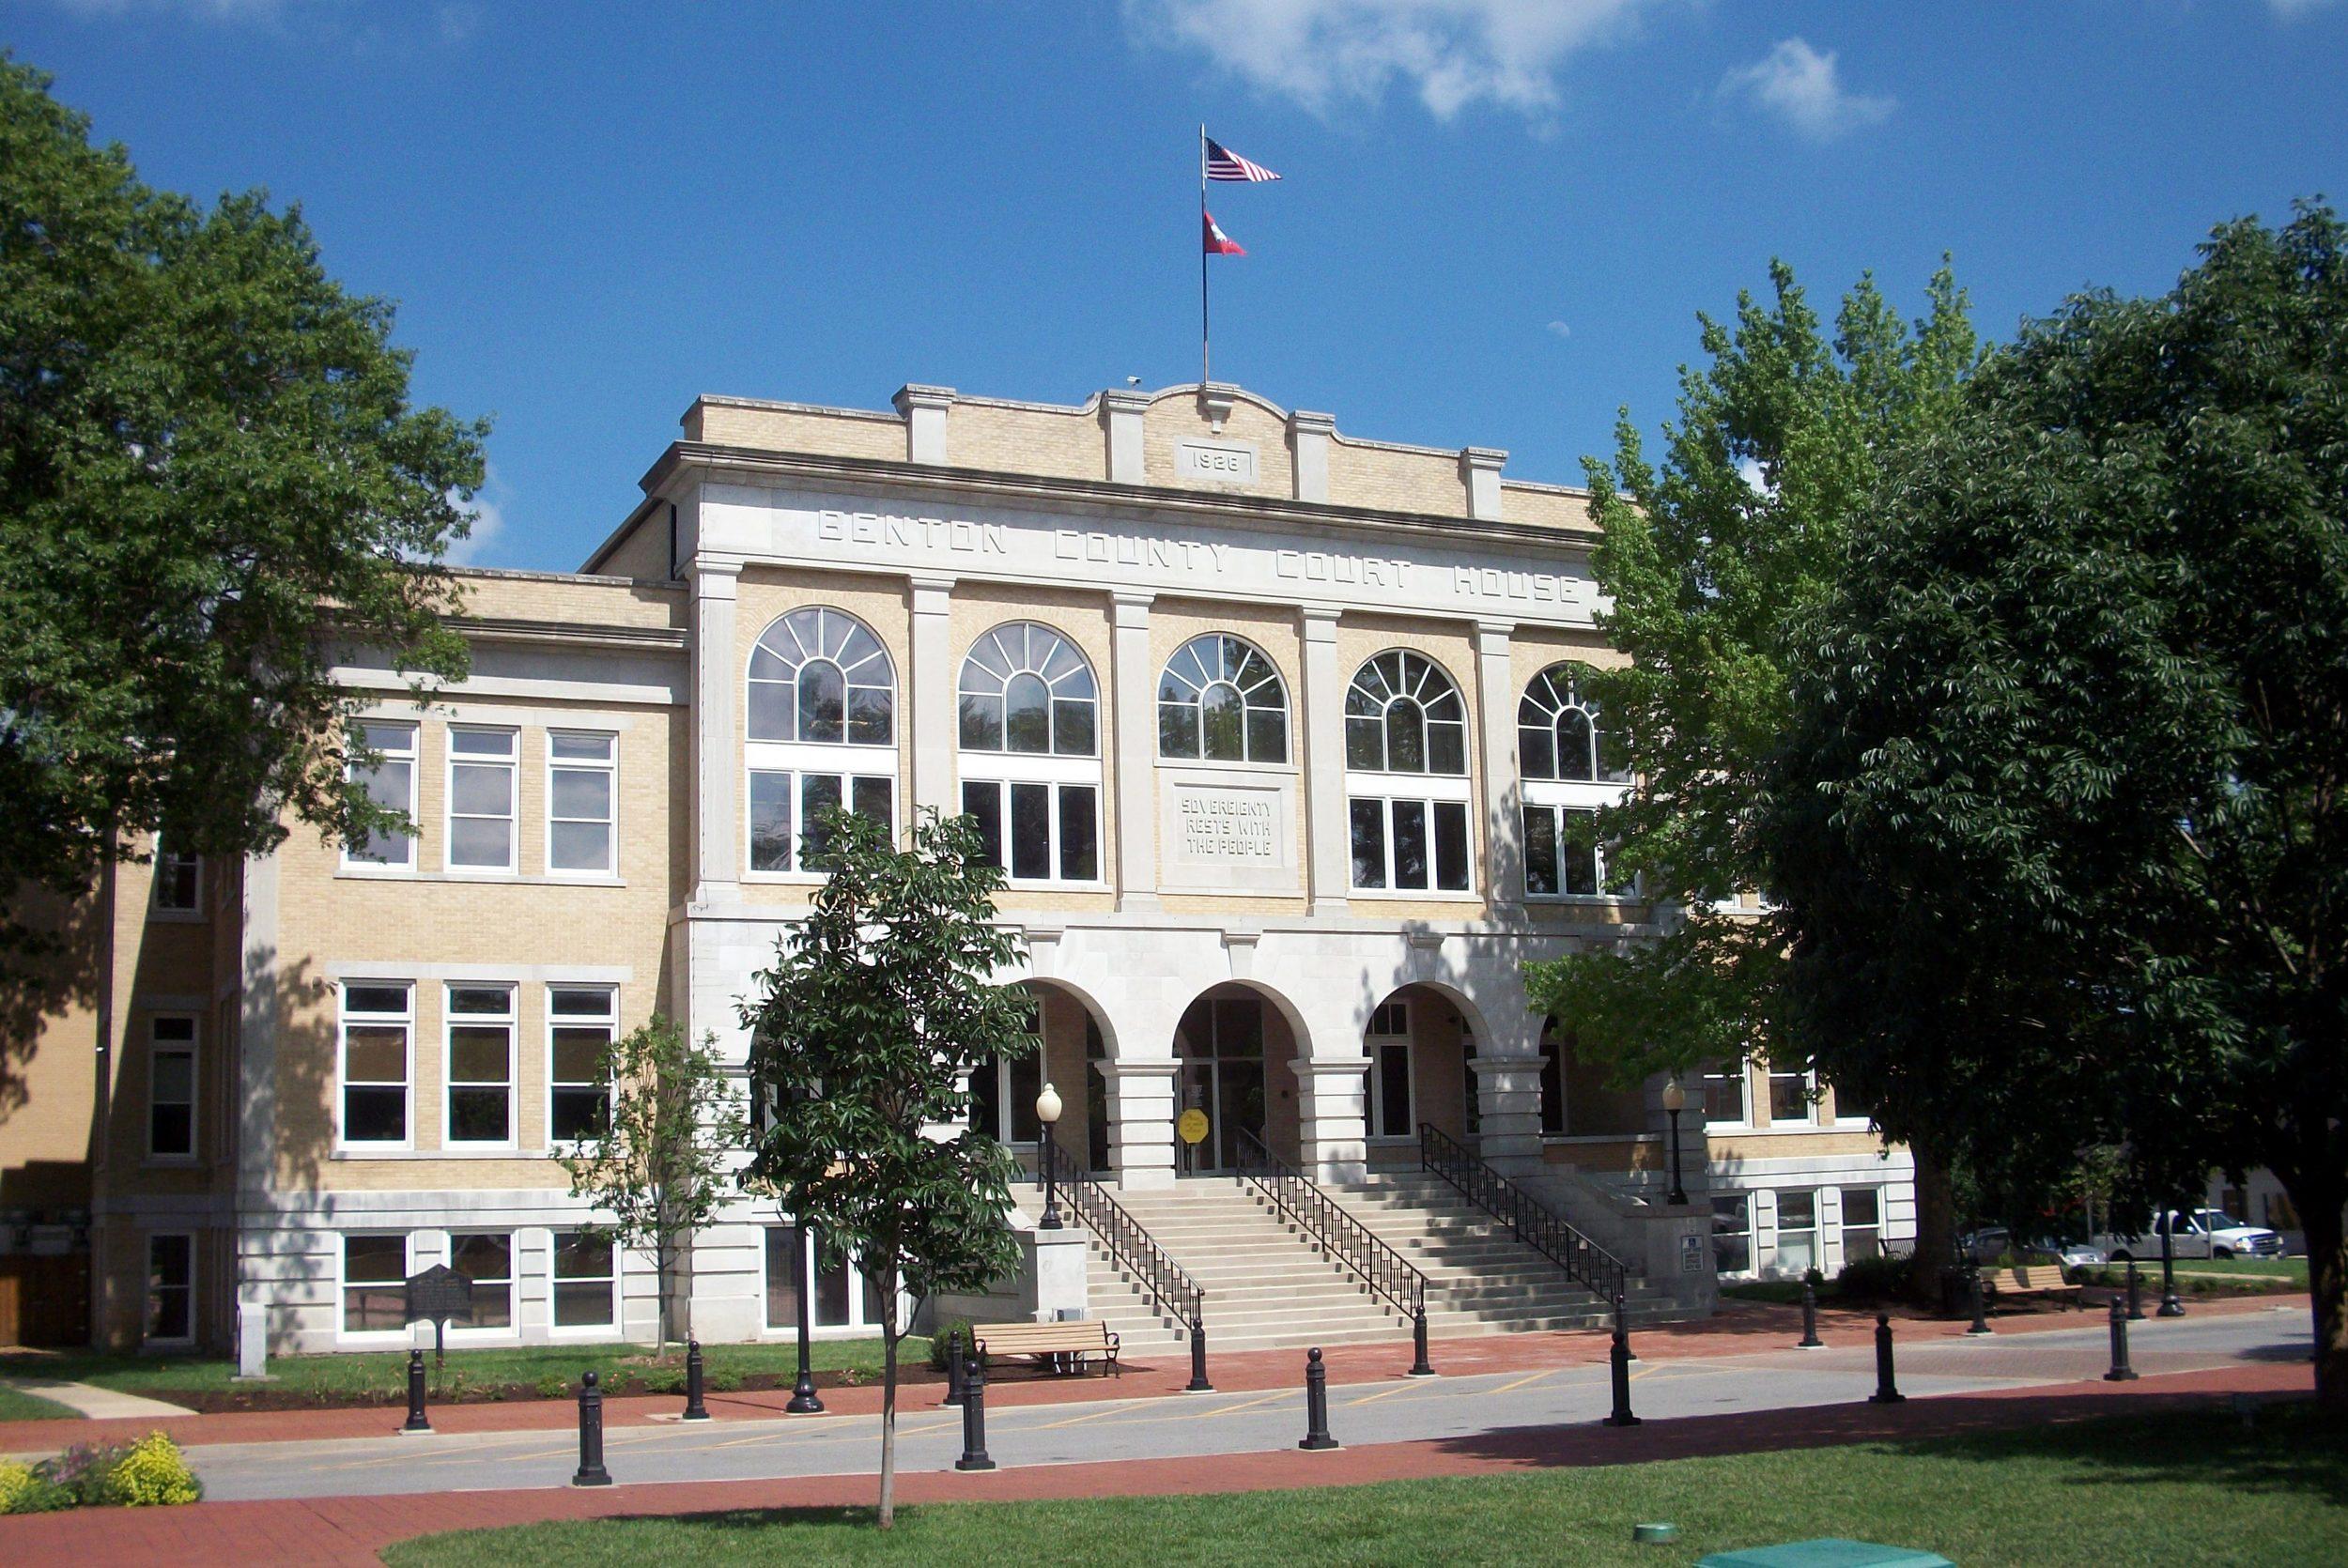 Benton County Courthouse Renovation